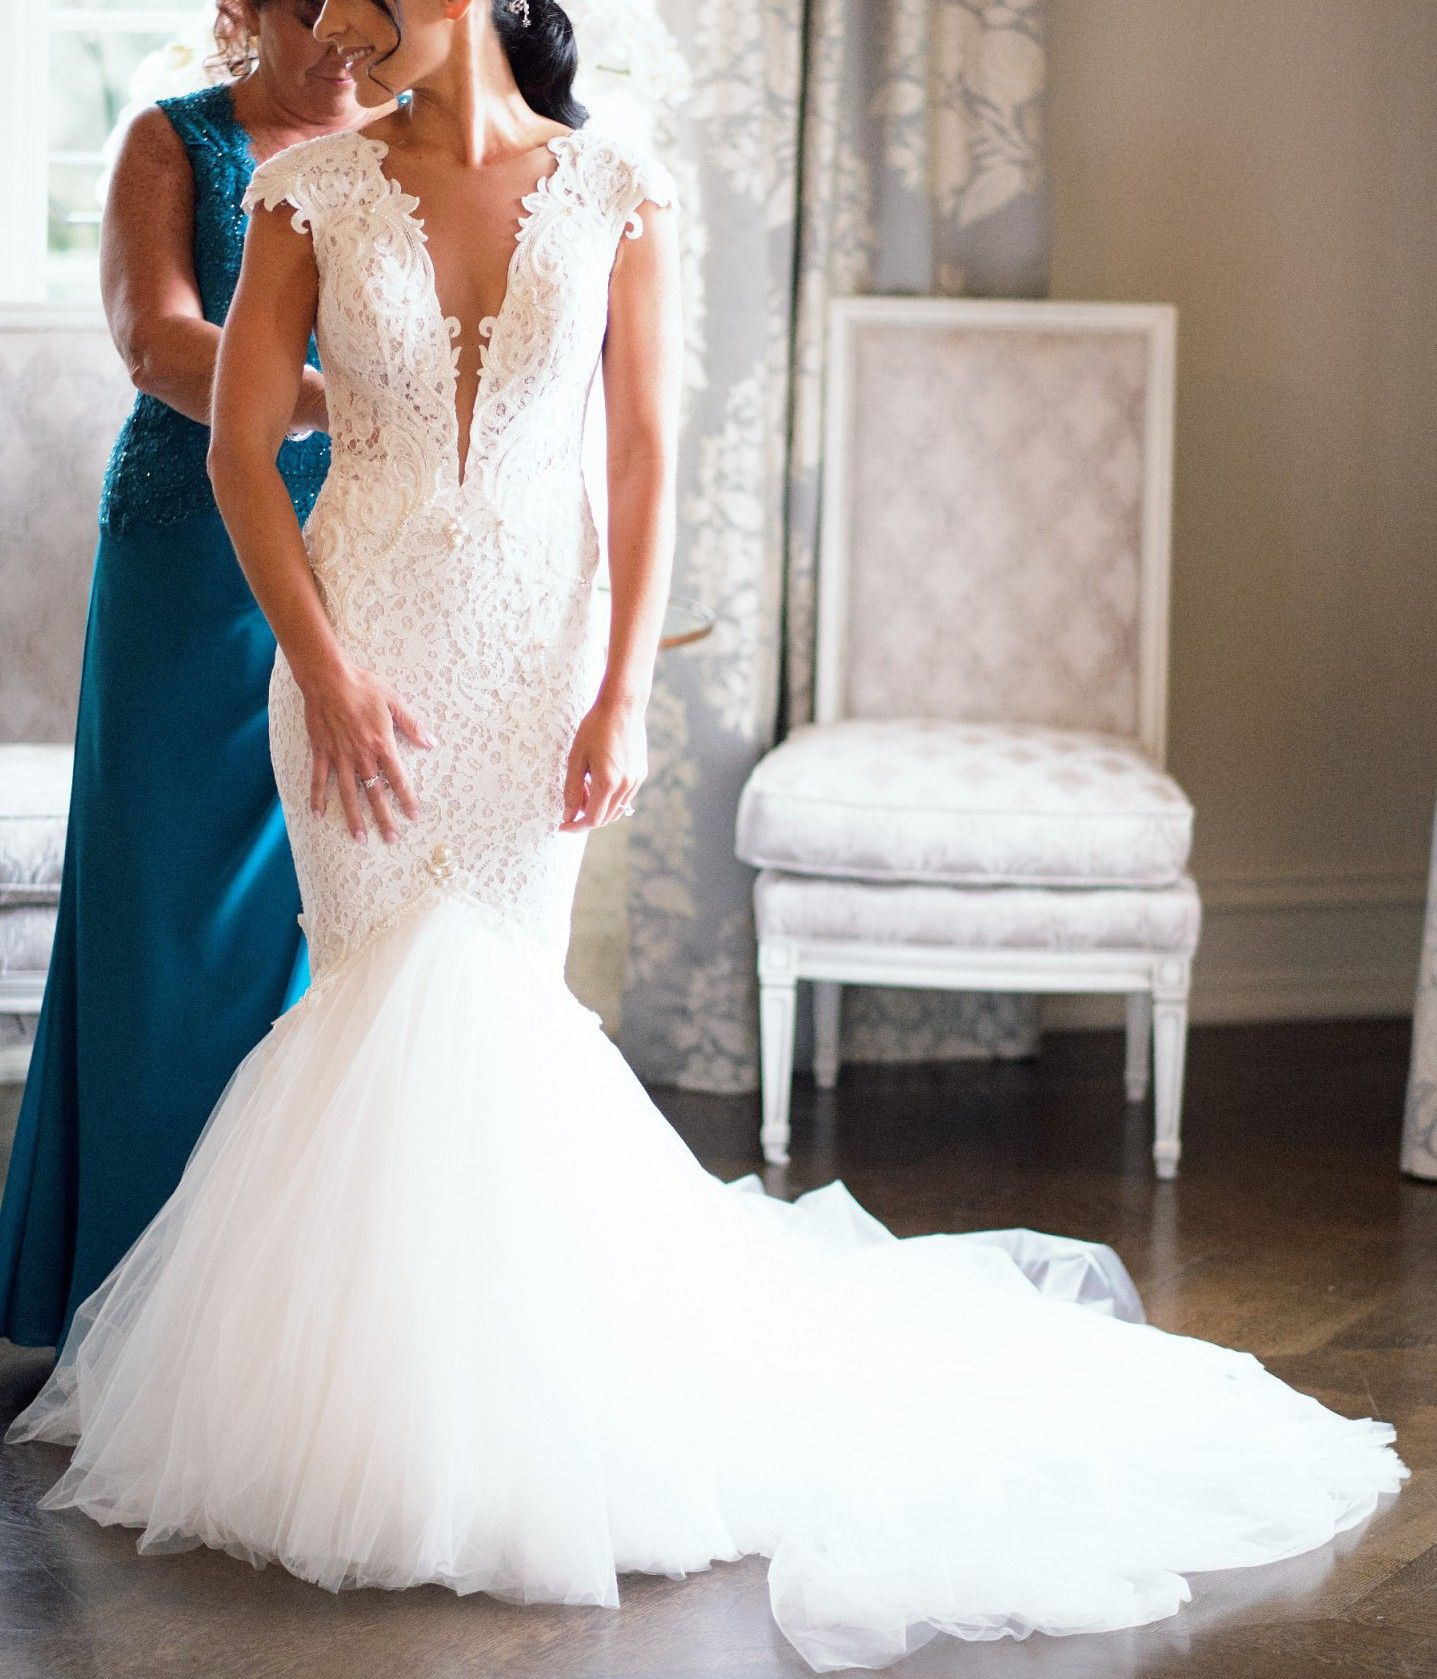 Berta Berta 16 13 Used Wedding Dress Save 72 Wedding Dresses Used Wedding Dresses Dresses [ 1679 x 1437 Pixel ]